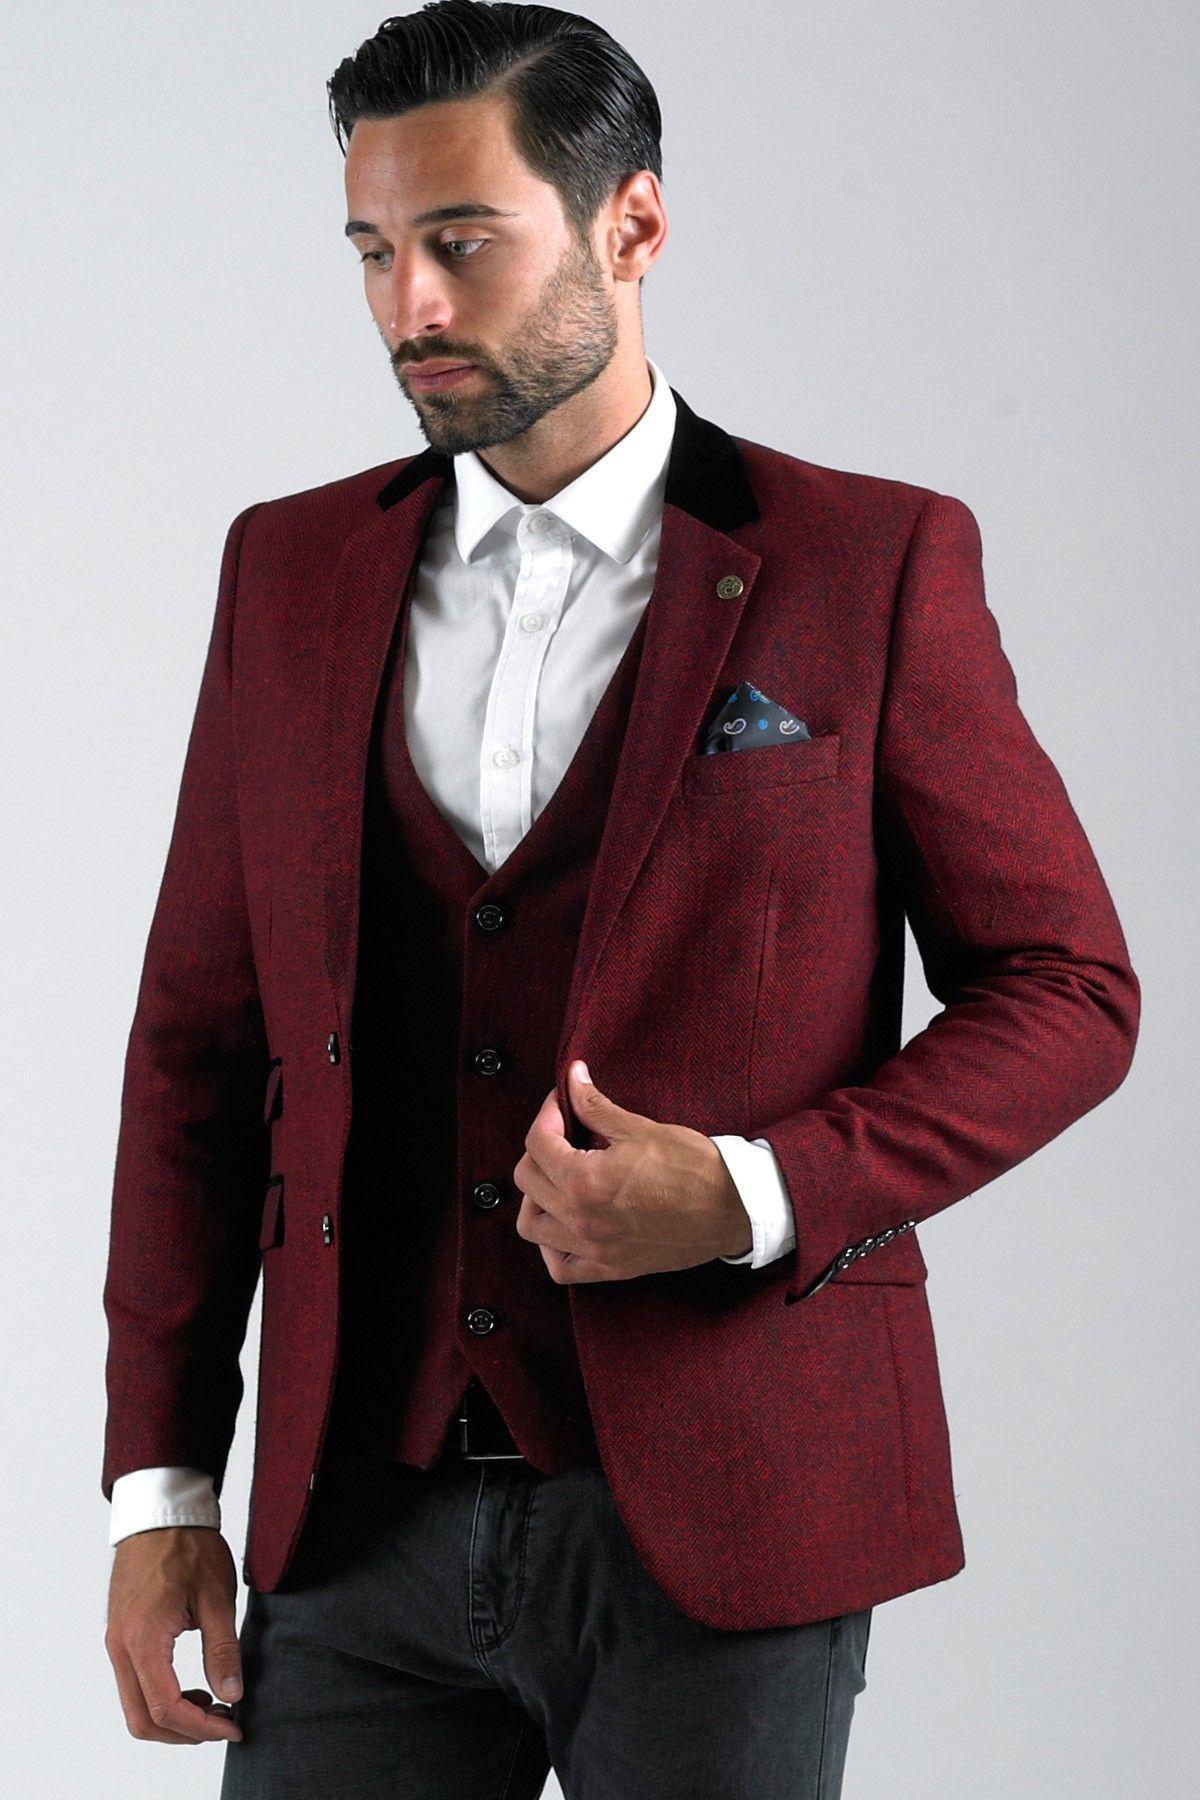 Mens Red Wine Contrast Trim Tweed Blazer | Stuff to buy ...